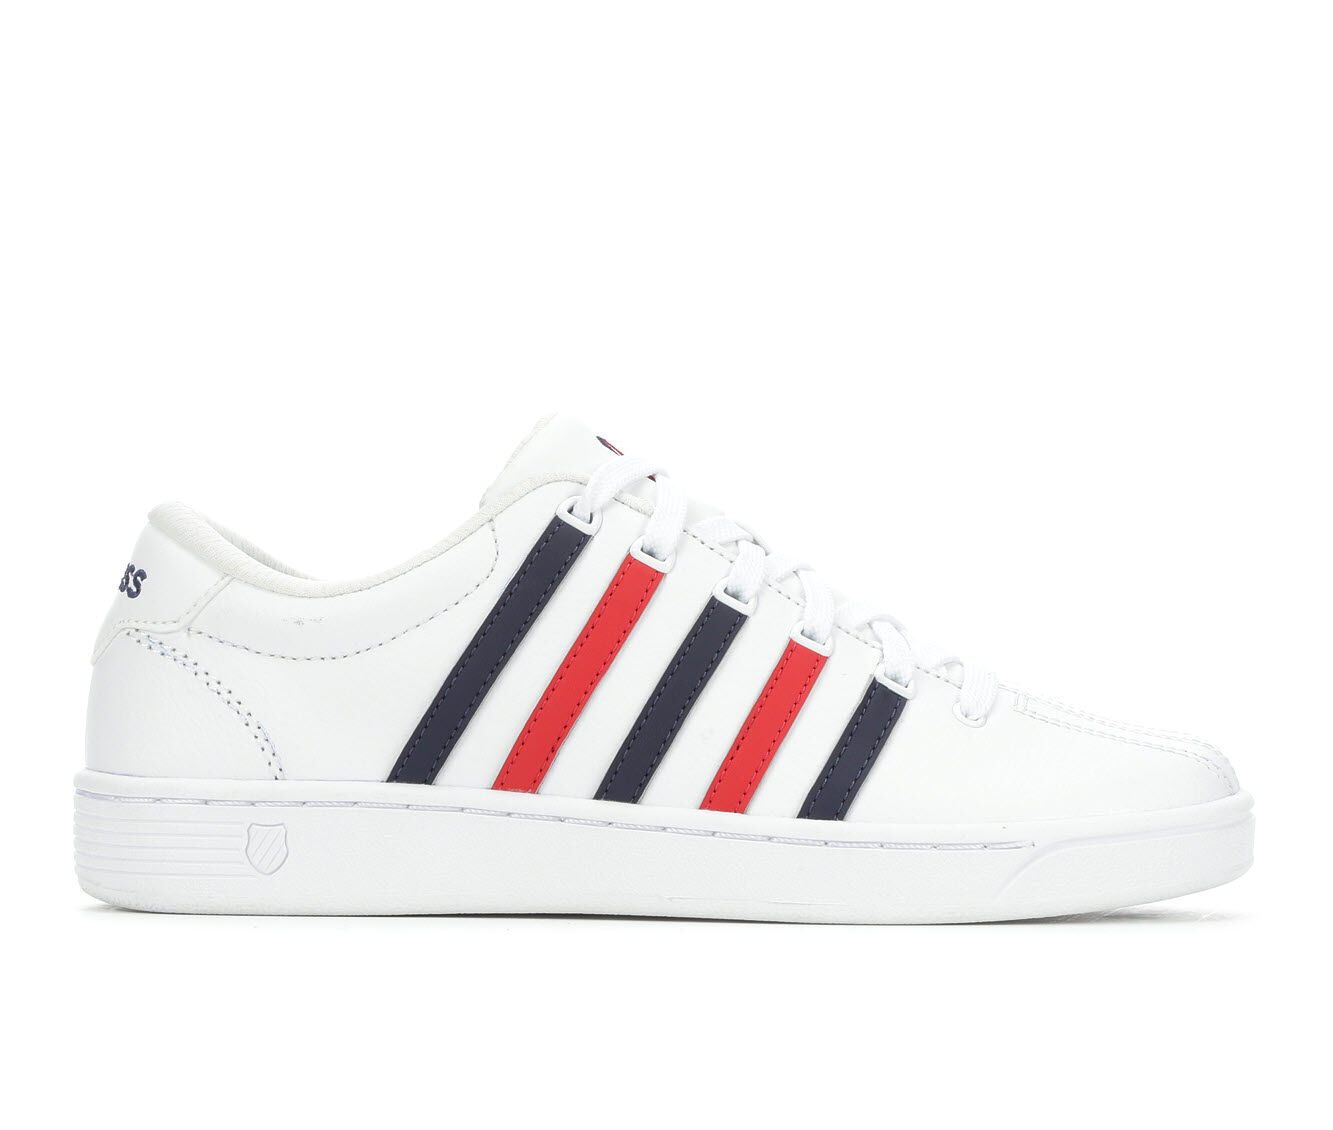 Women's K-Swiss Court Pro II Comfort Retro Sneakers White/Red/Blue